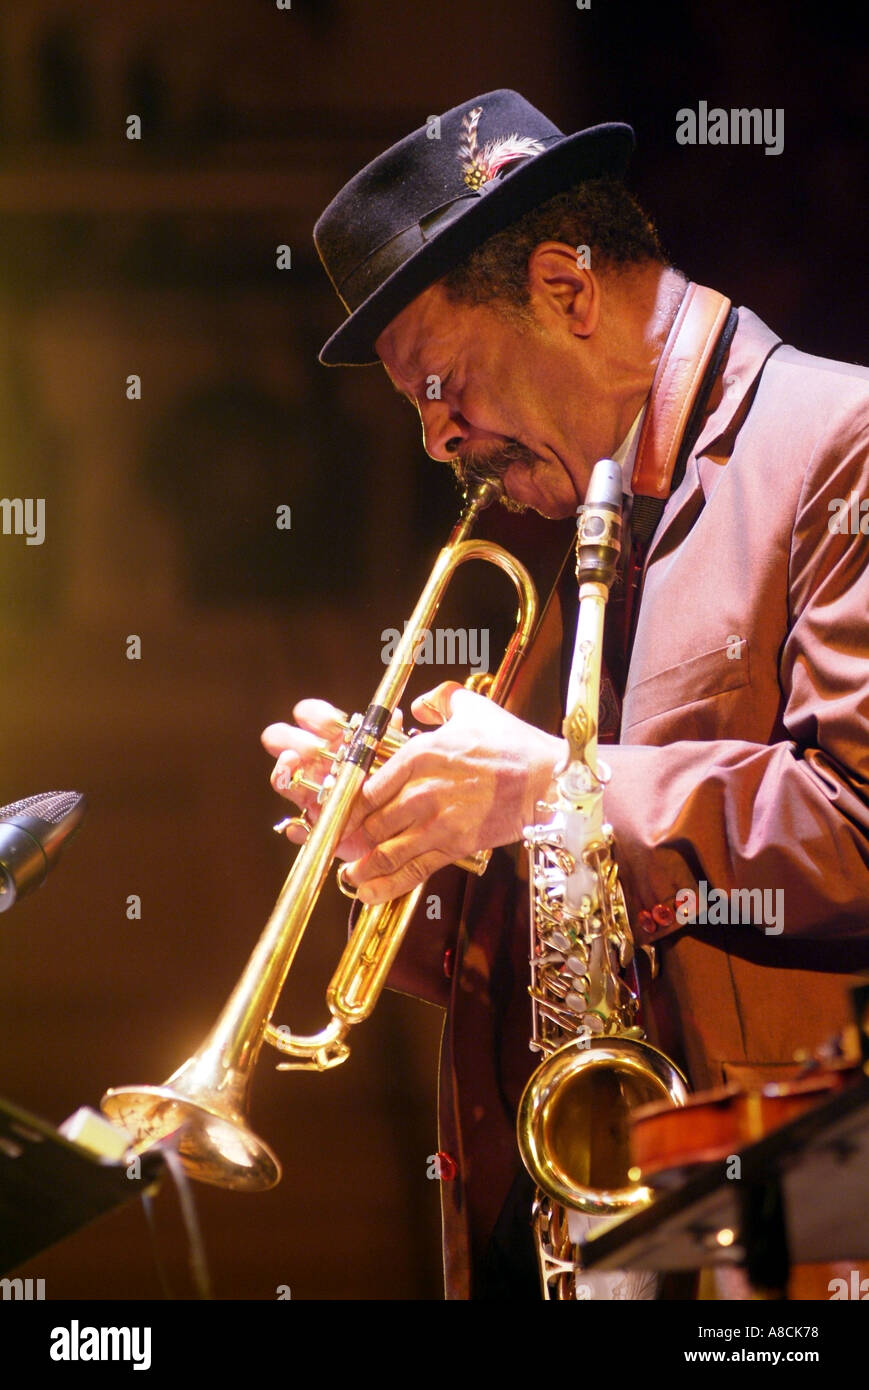 Legendary jazz musician Ornette Coleman playing jazz trumpet and saxophone at Cheltenham Jazz Music Festival - Stock Image